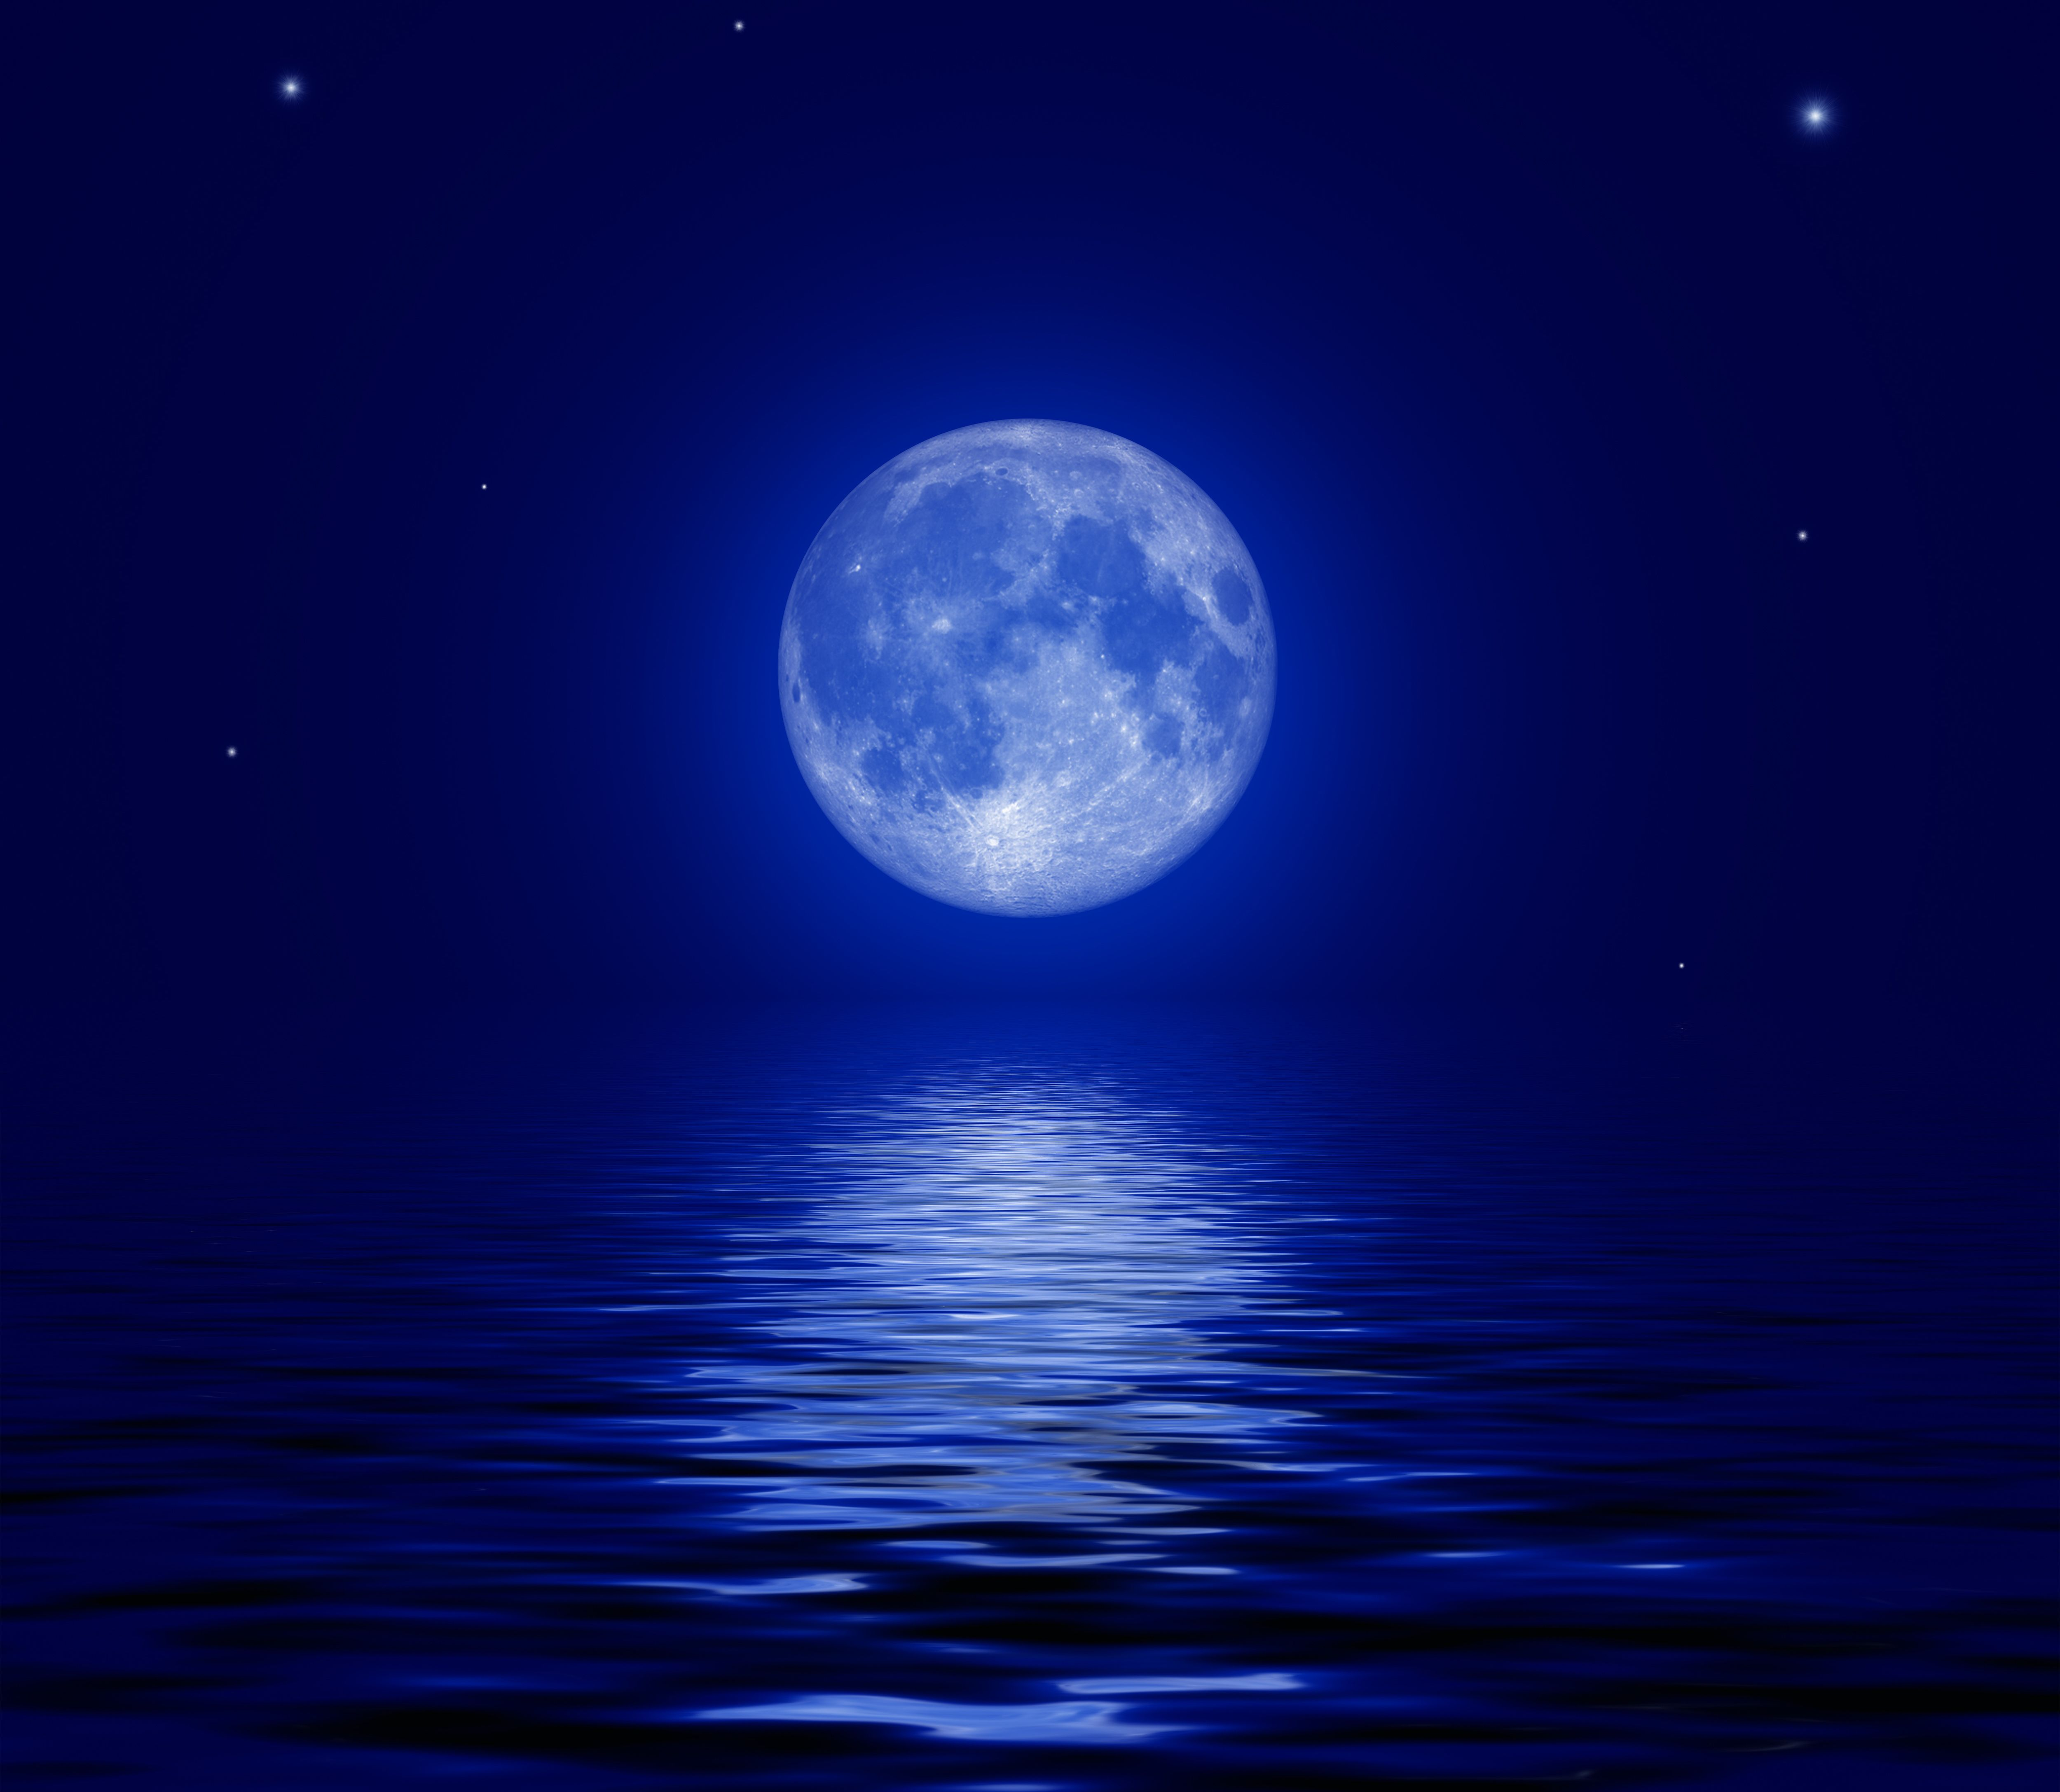 Full Moon in the Ocean Full Moon over the Sea Computer 5000x4350